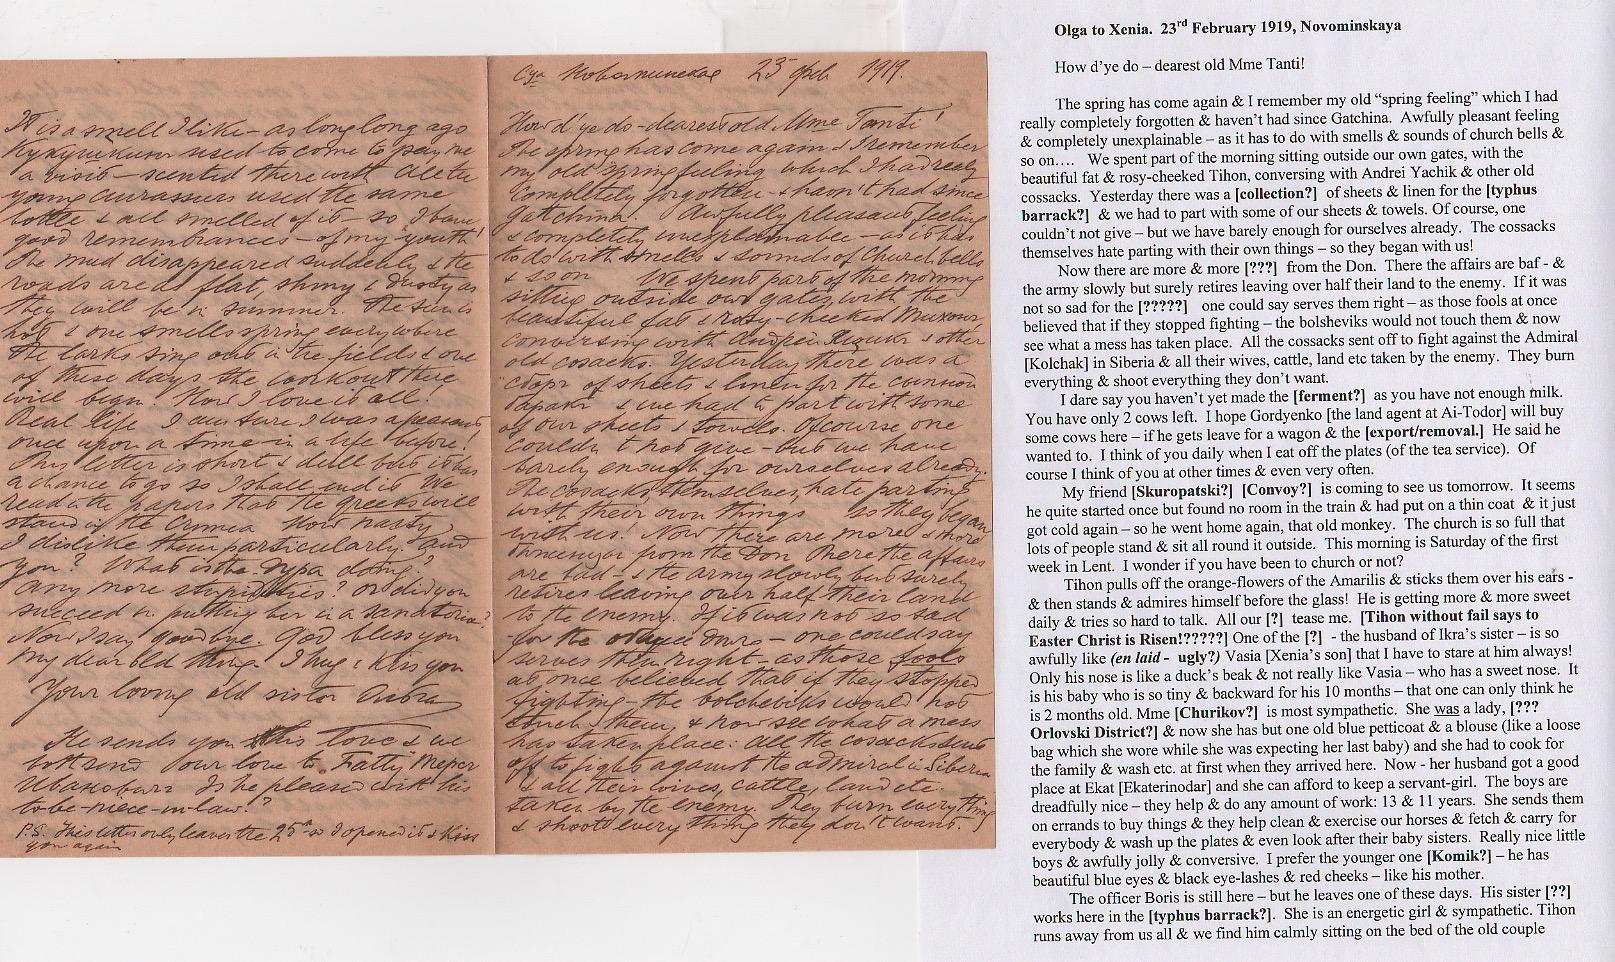 Royalty Grand Duchess Olga Correspondence To Her Sister Grand Duchess Xenia 1916-1920 - Image 12 of 47